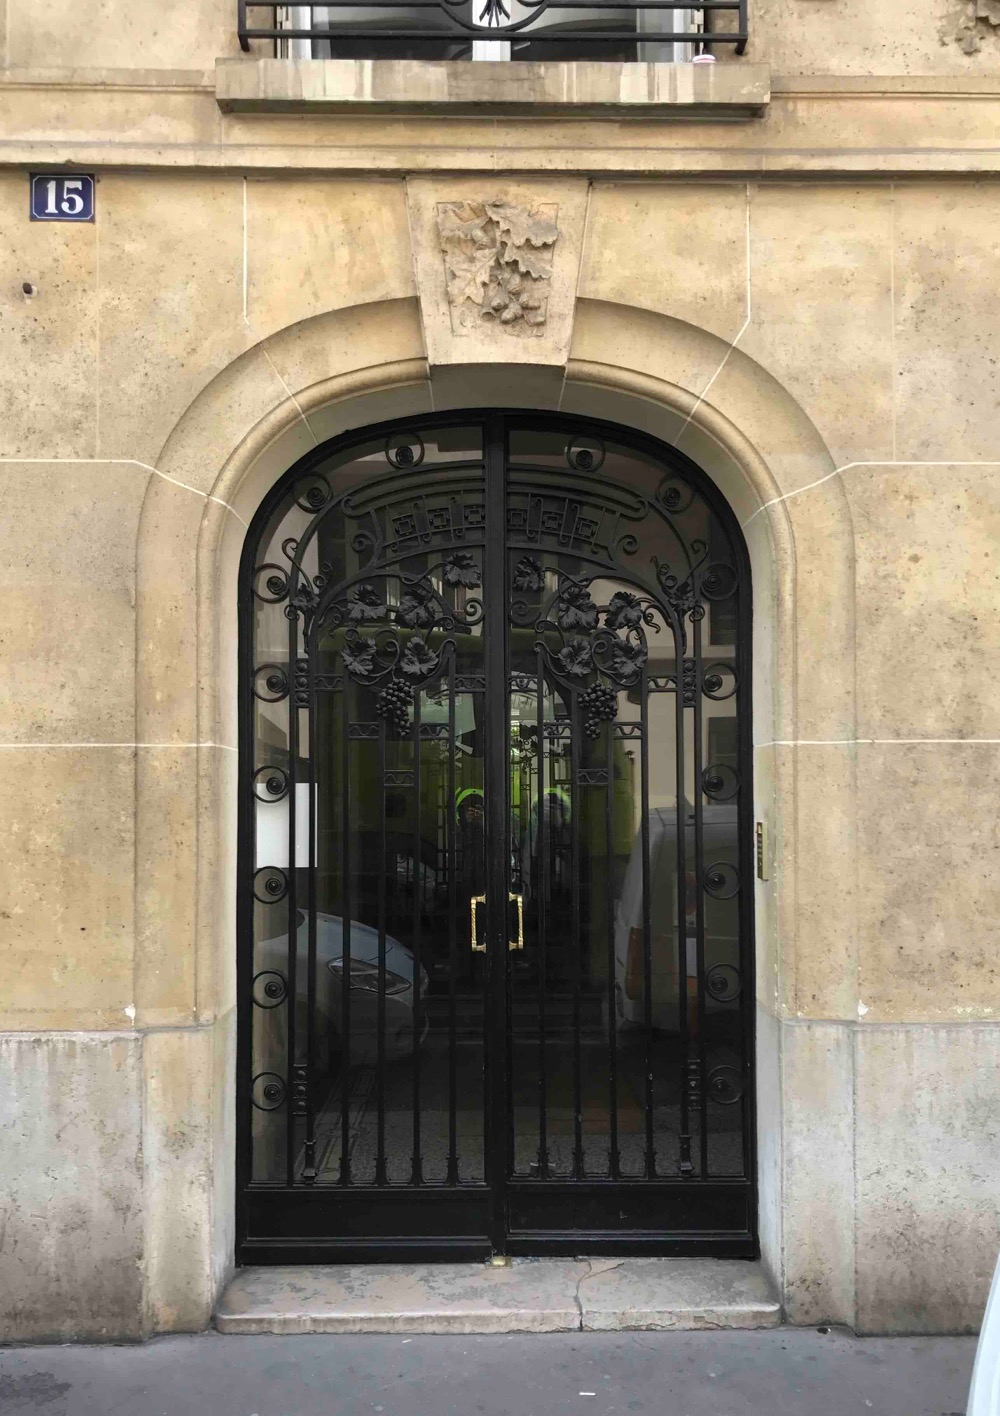 Porte Fer Forgé - 15 Rue Chartran - Neuilly